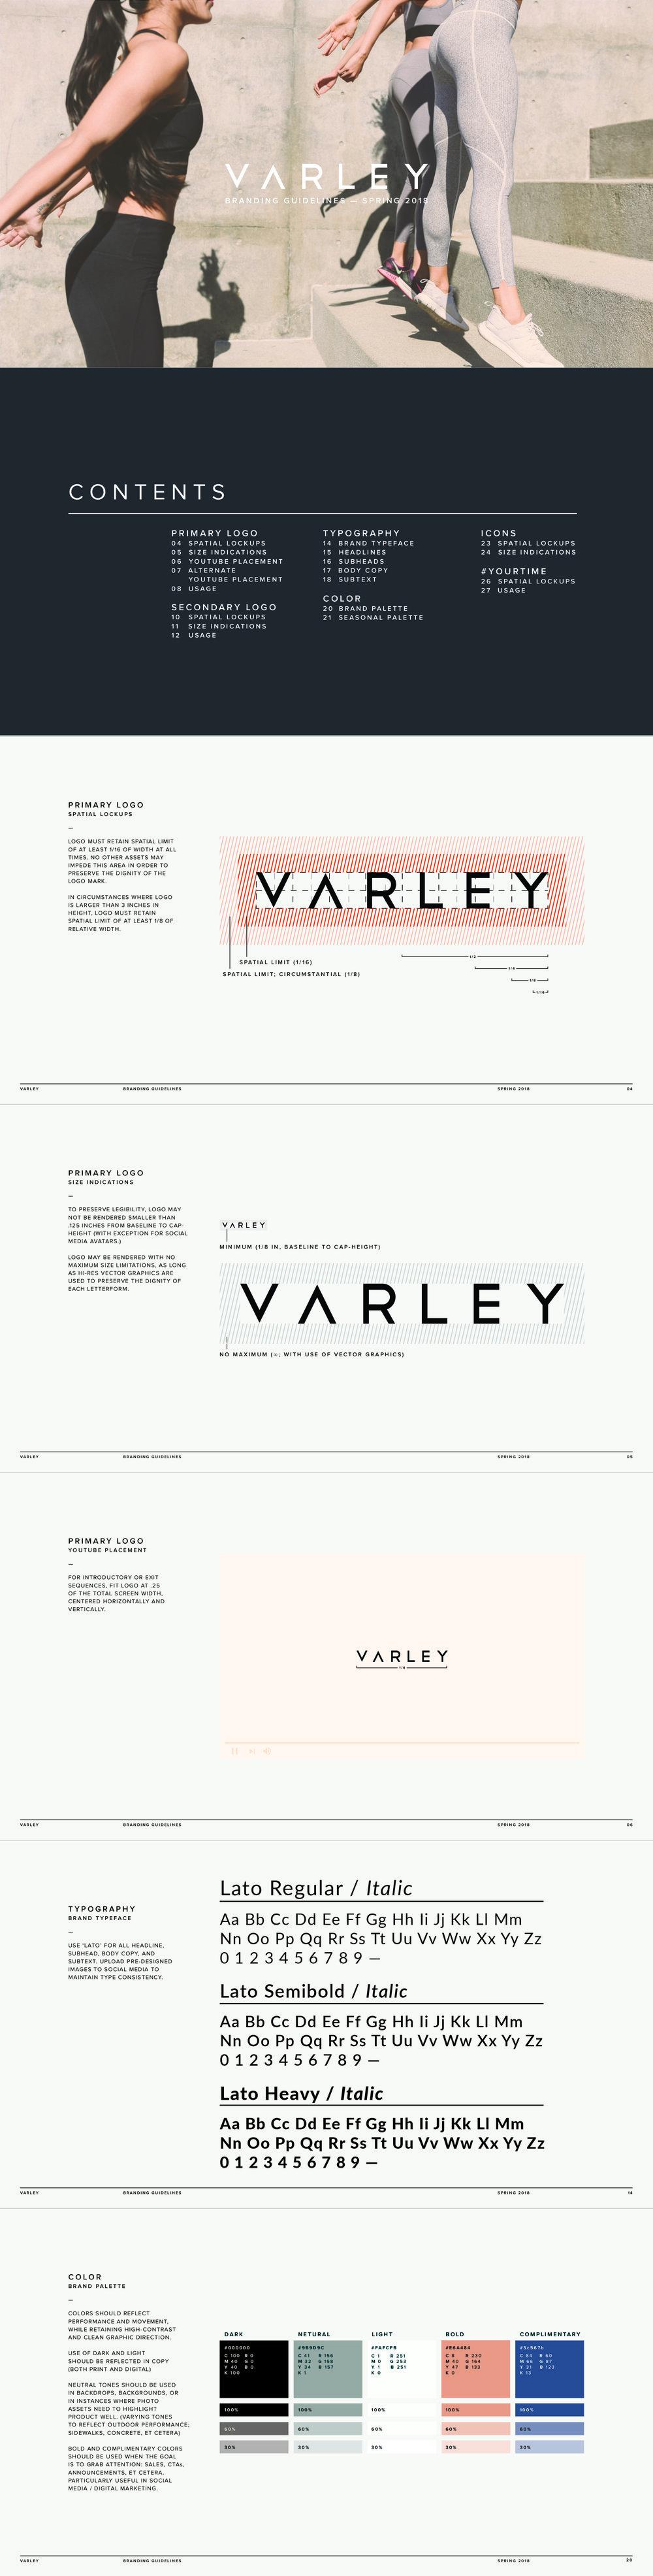 varleyselects.jpg